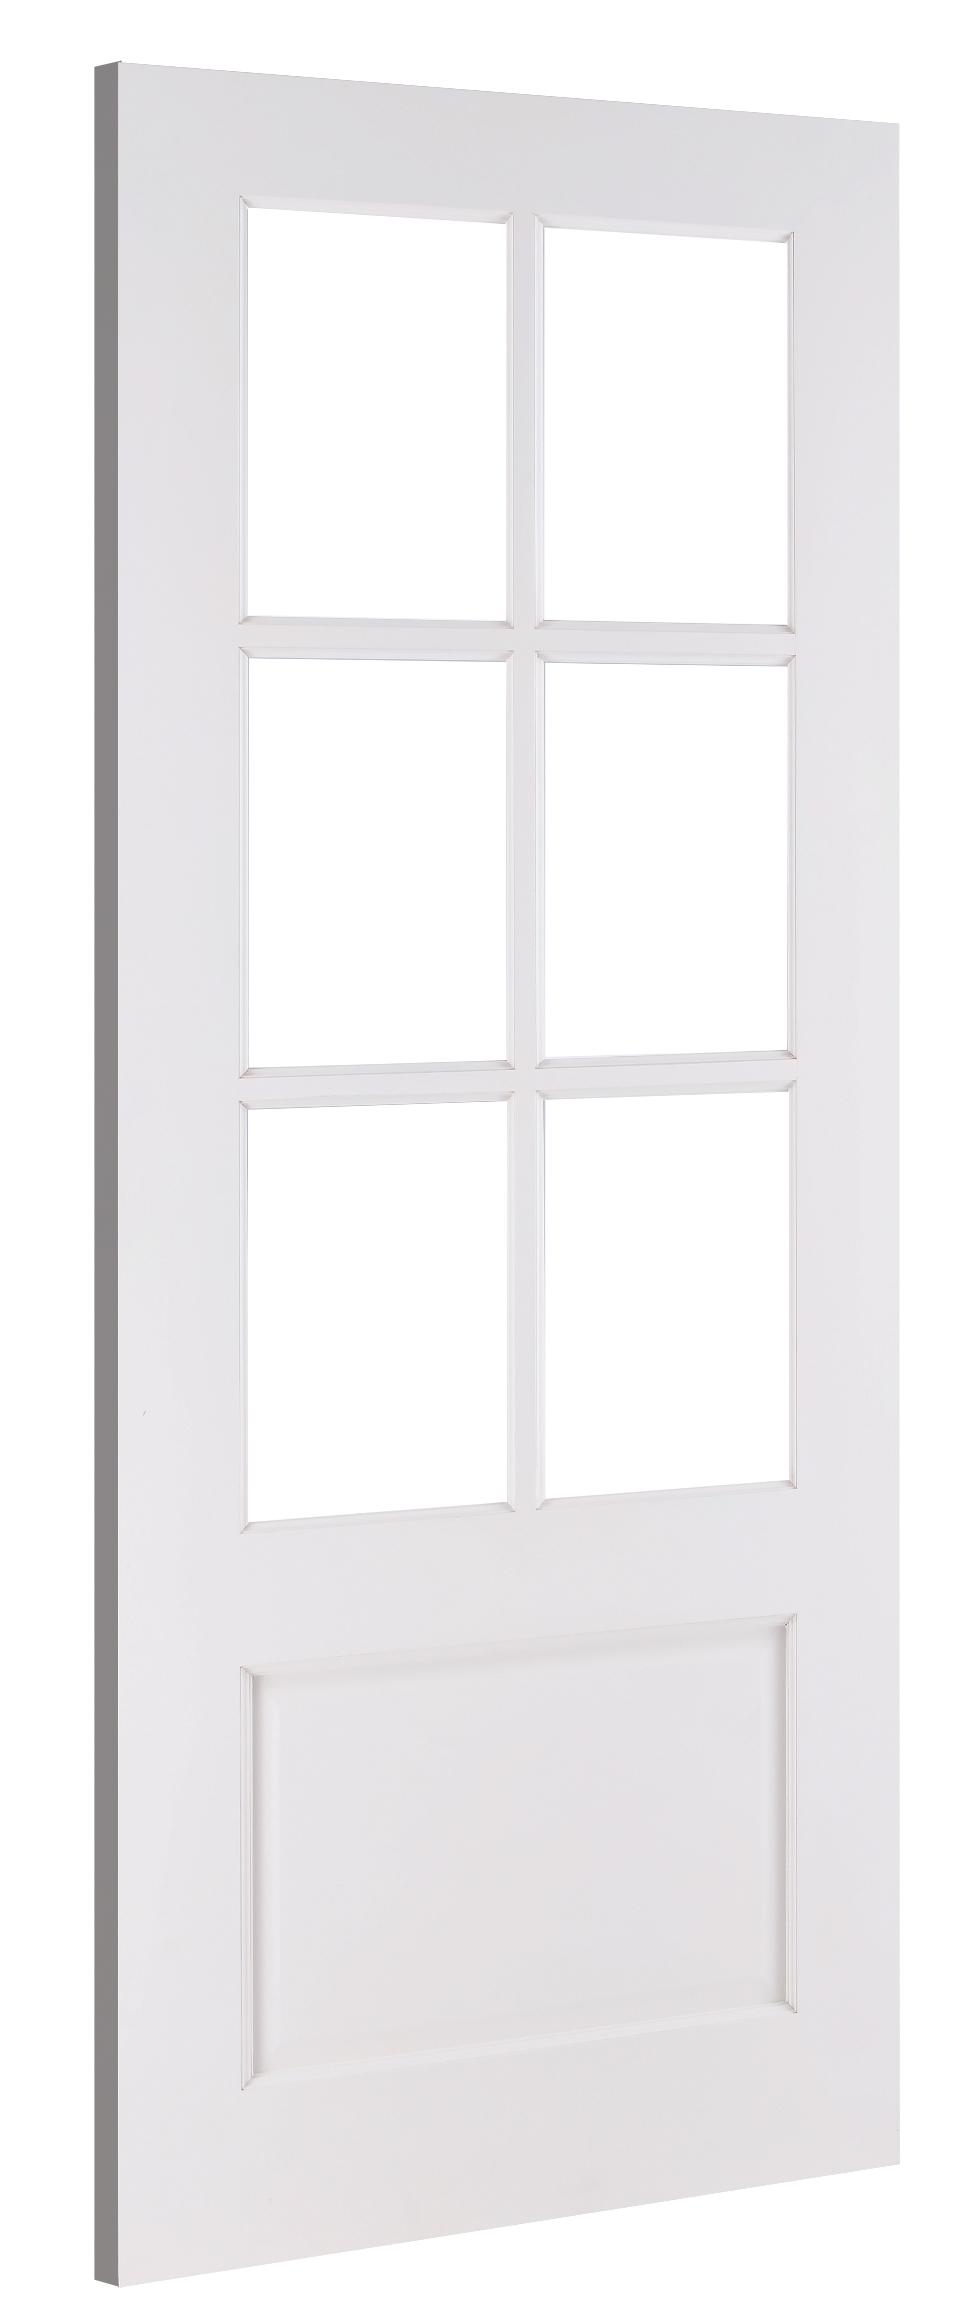 Primed Doors NM3GB